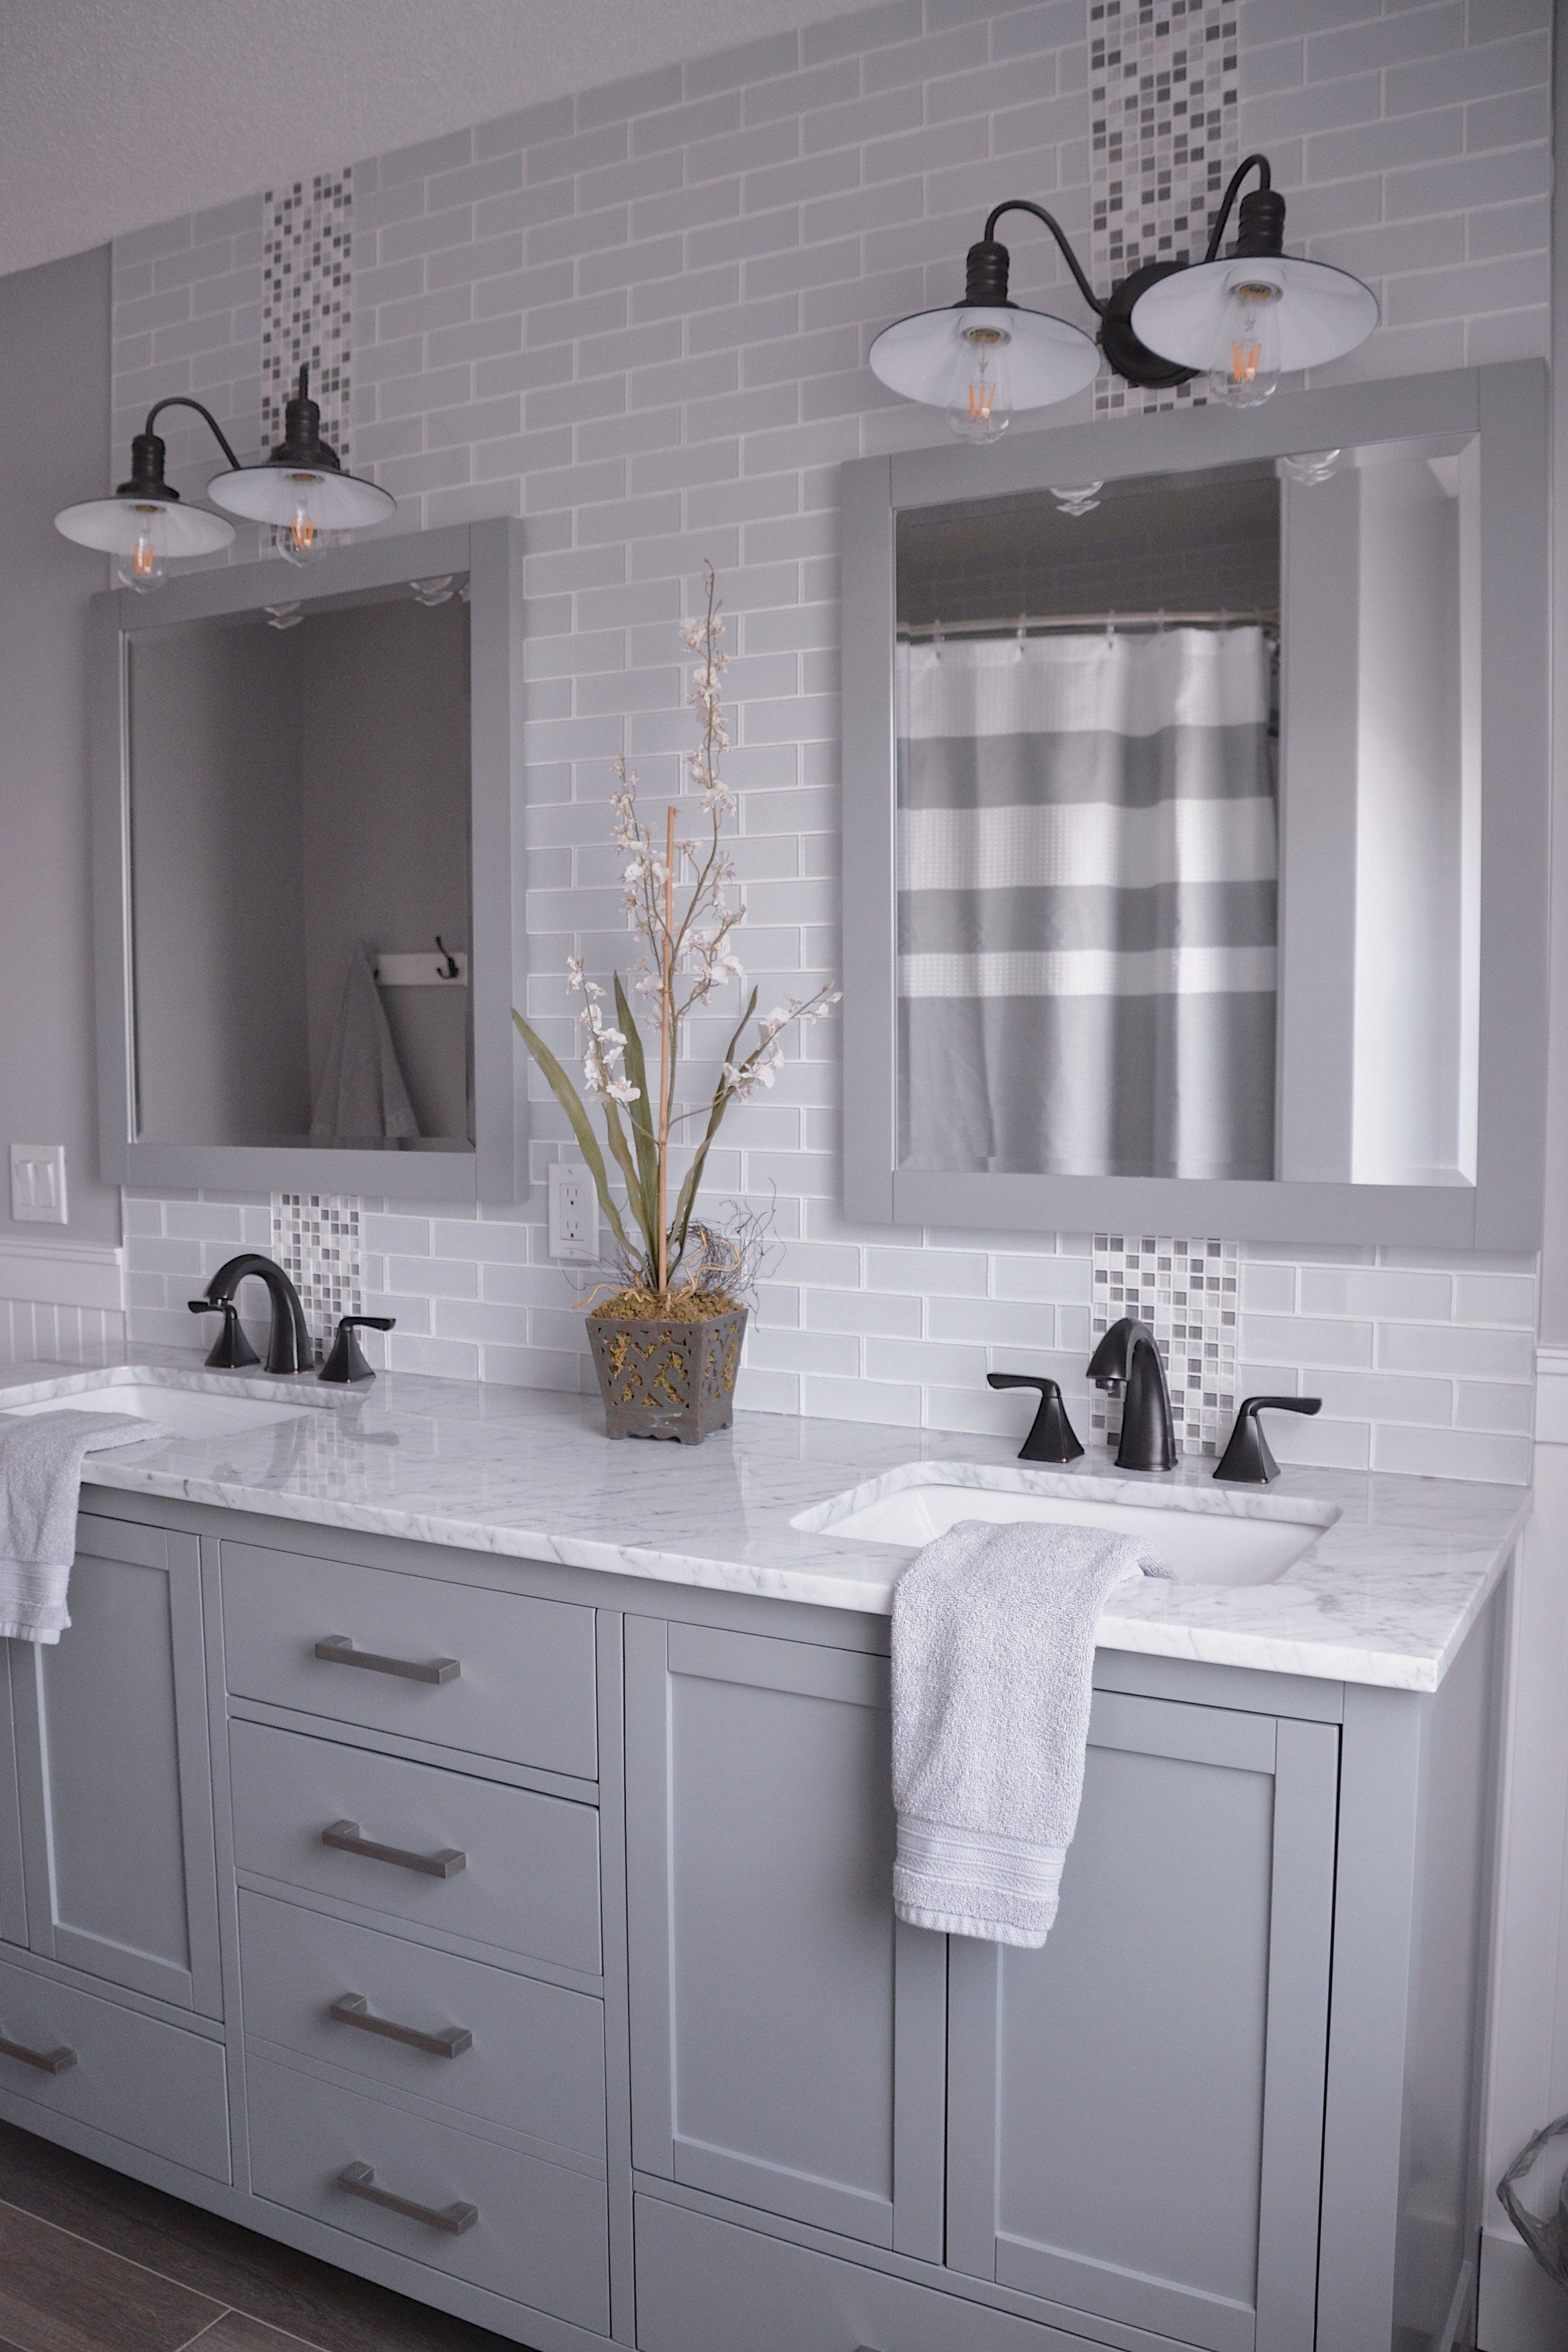 Main Bathroom Renovation Reveal